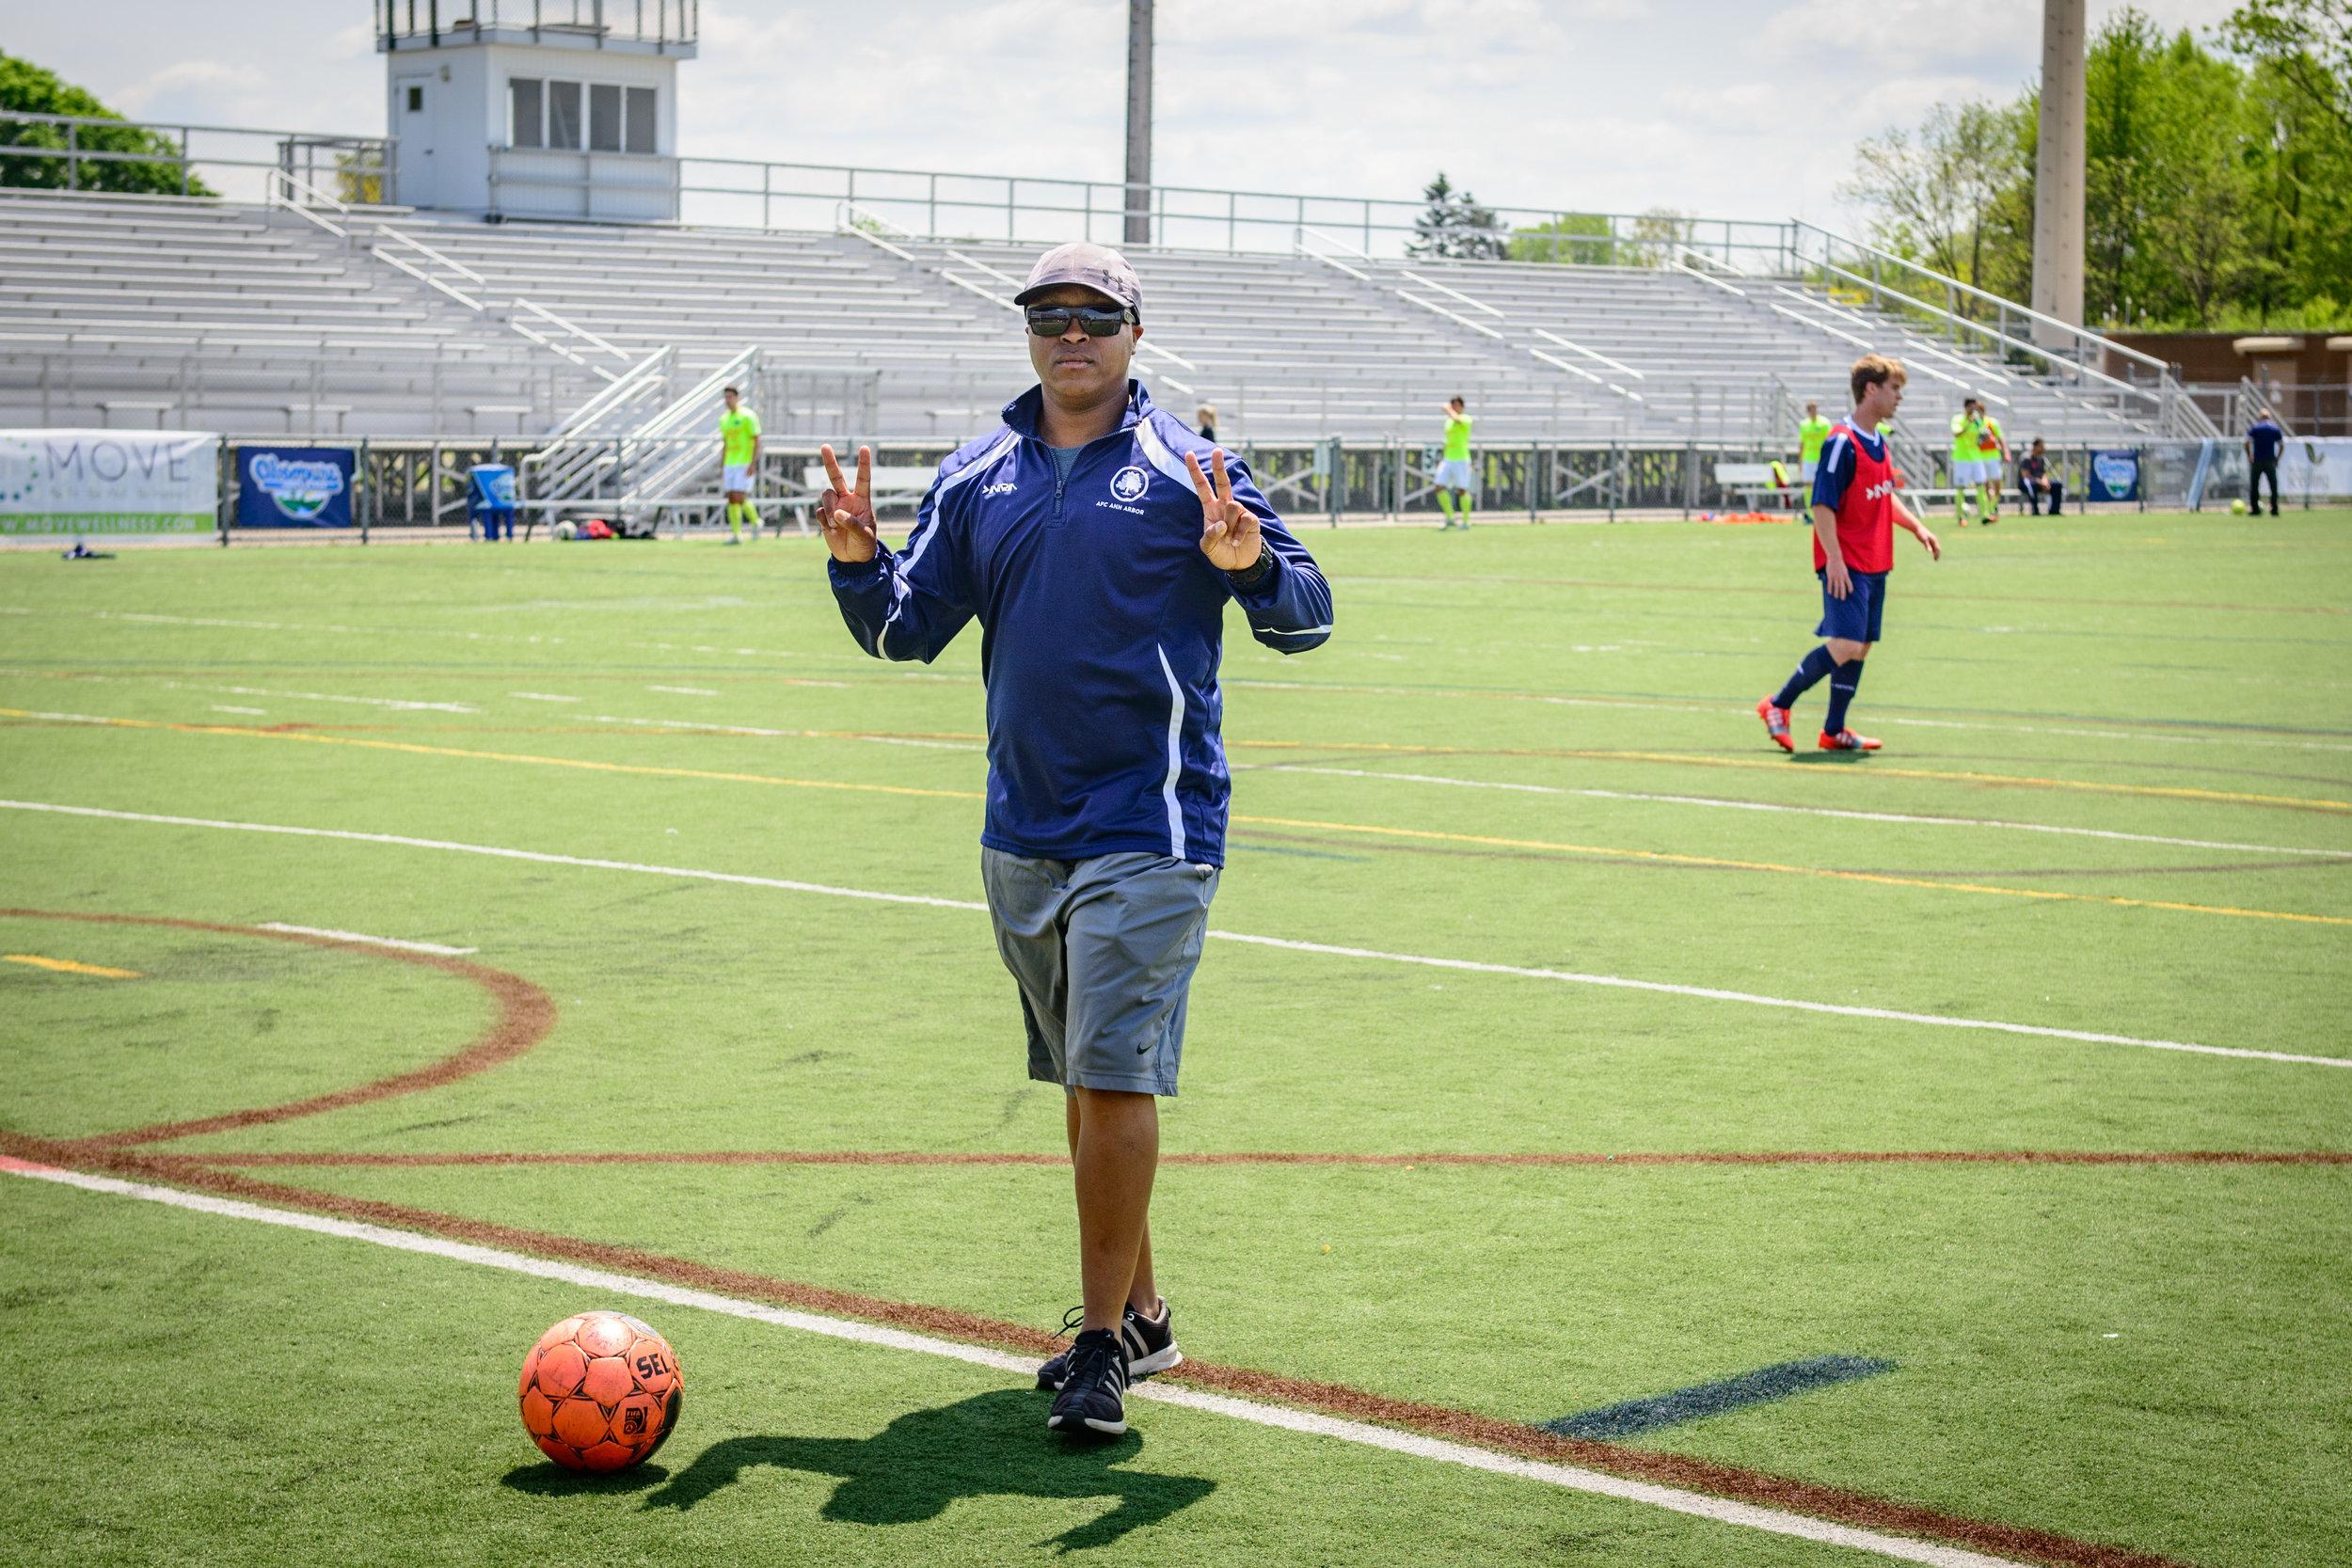 Ann Arbor Michigan Sporting May 22 2016-5844 (2).JPG